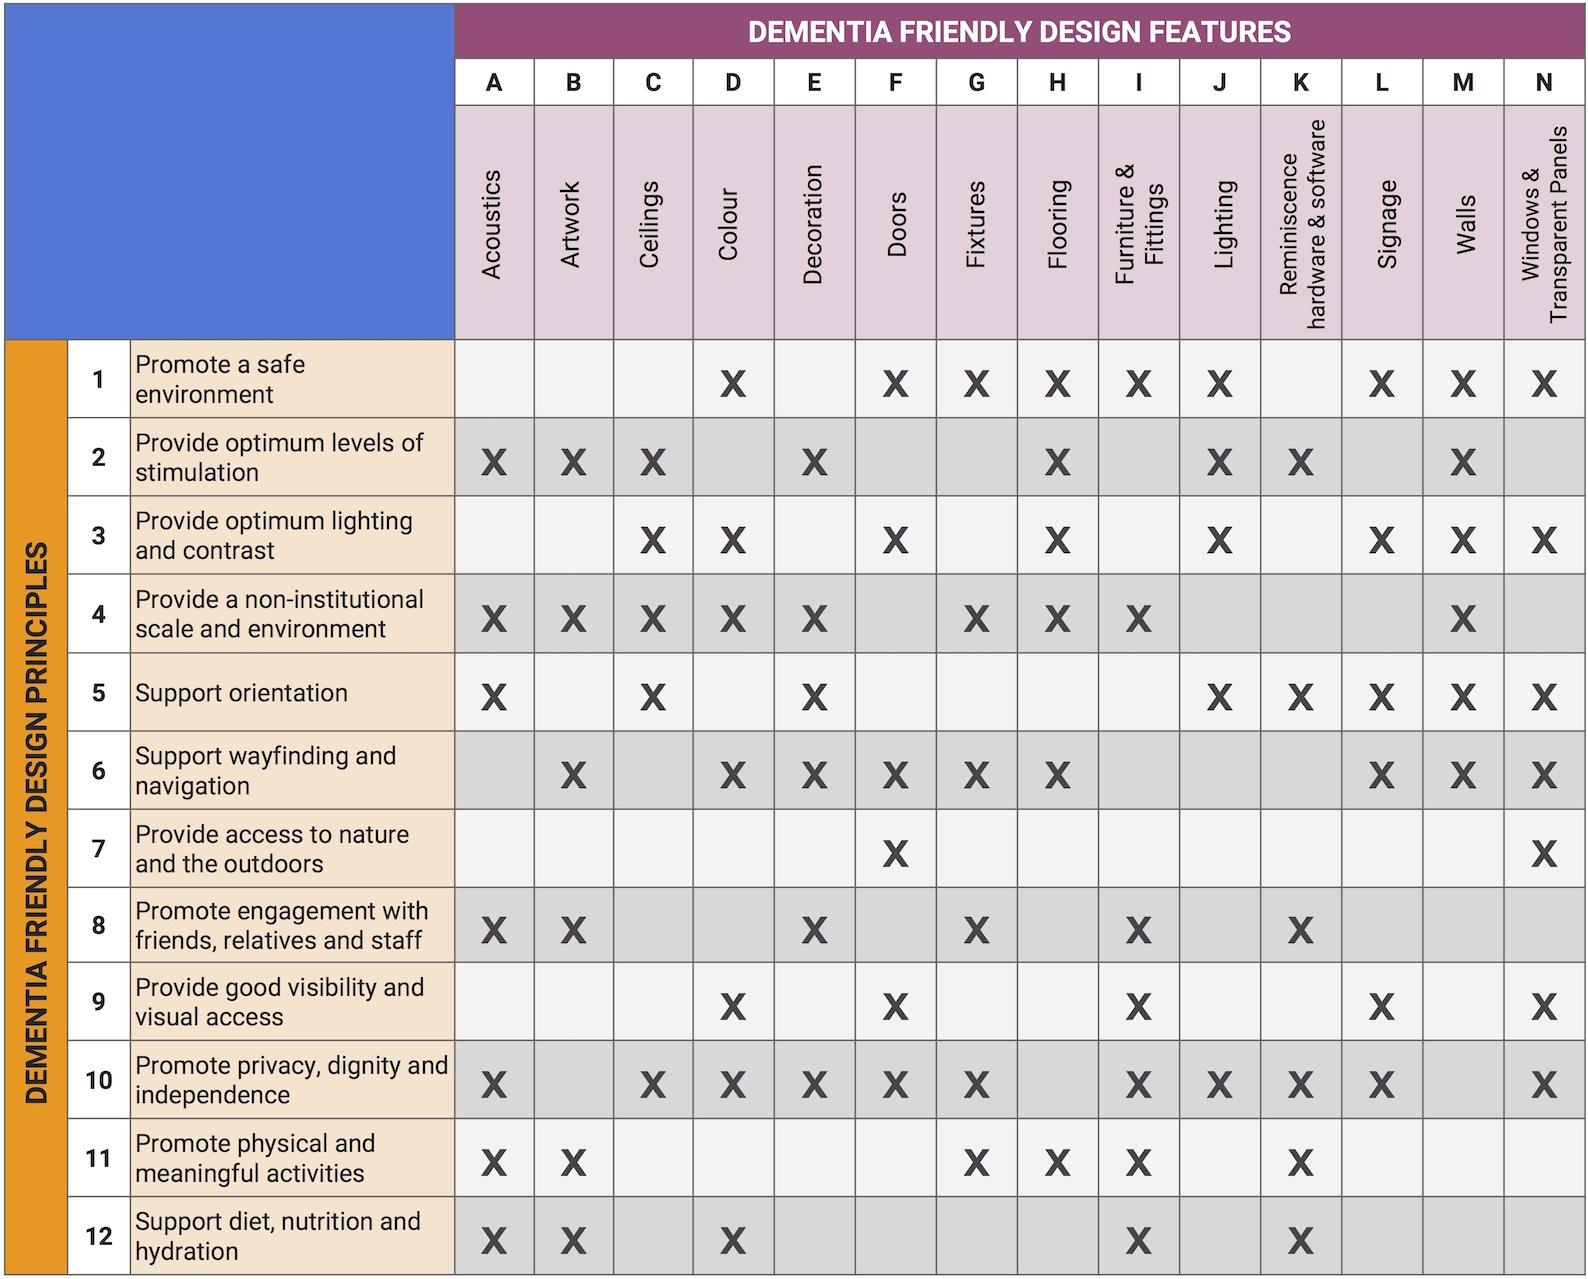 Table 1.  Core dementia-friendly design features